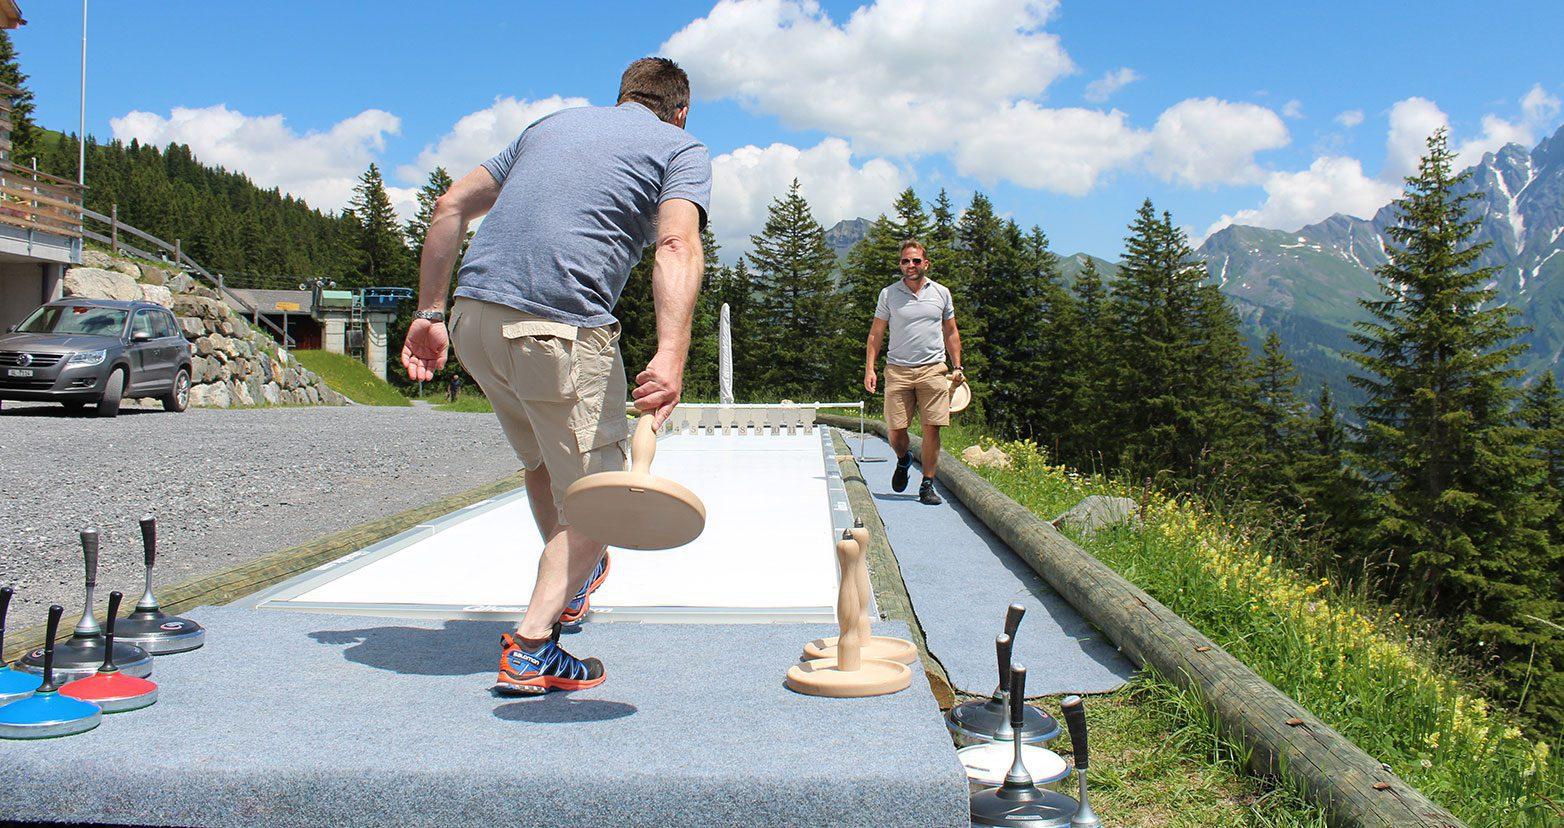 swiss ice skating